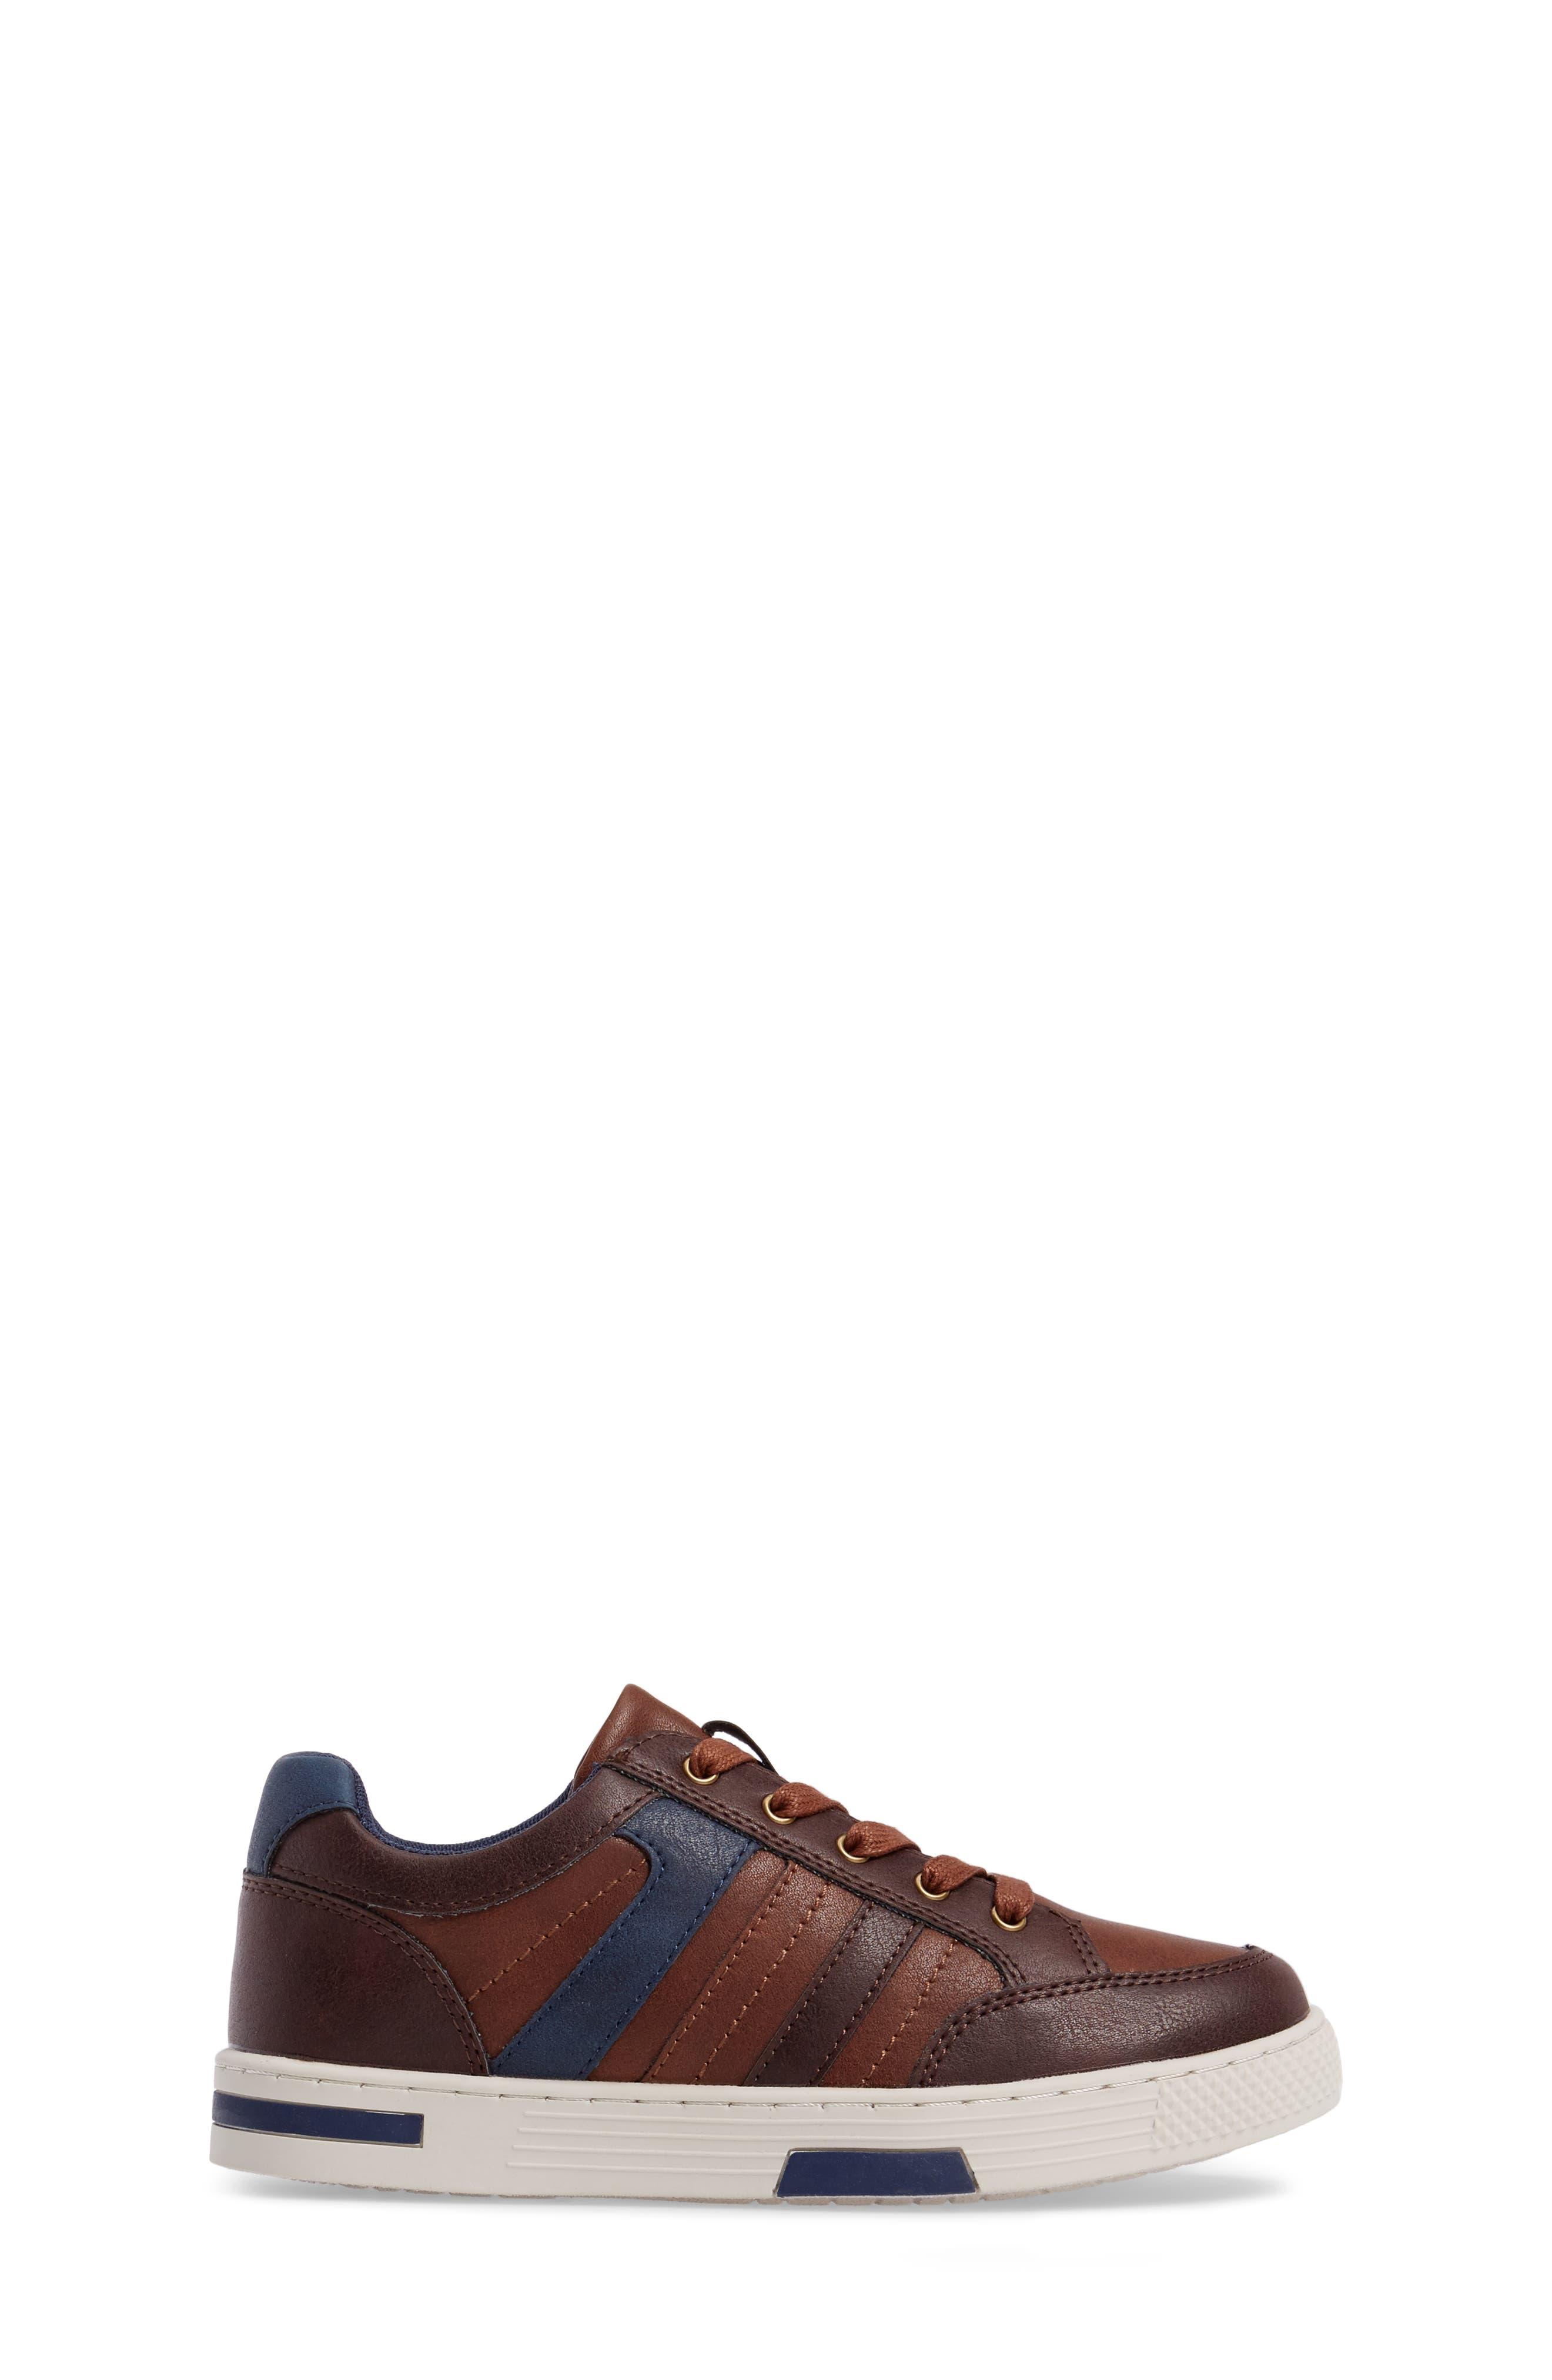 Trakk Sneaker,                             Alternate thumbnail 3, color,                             Brown Multi